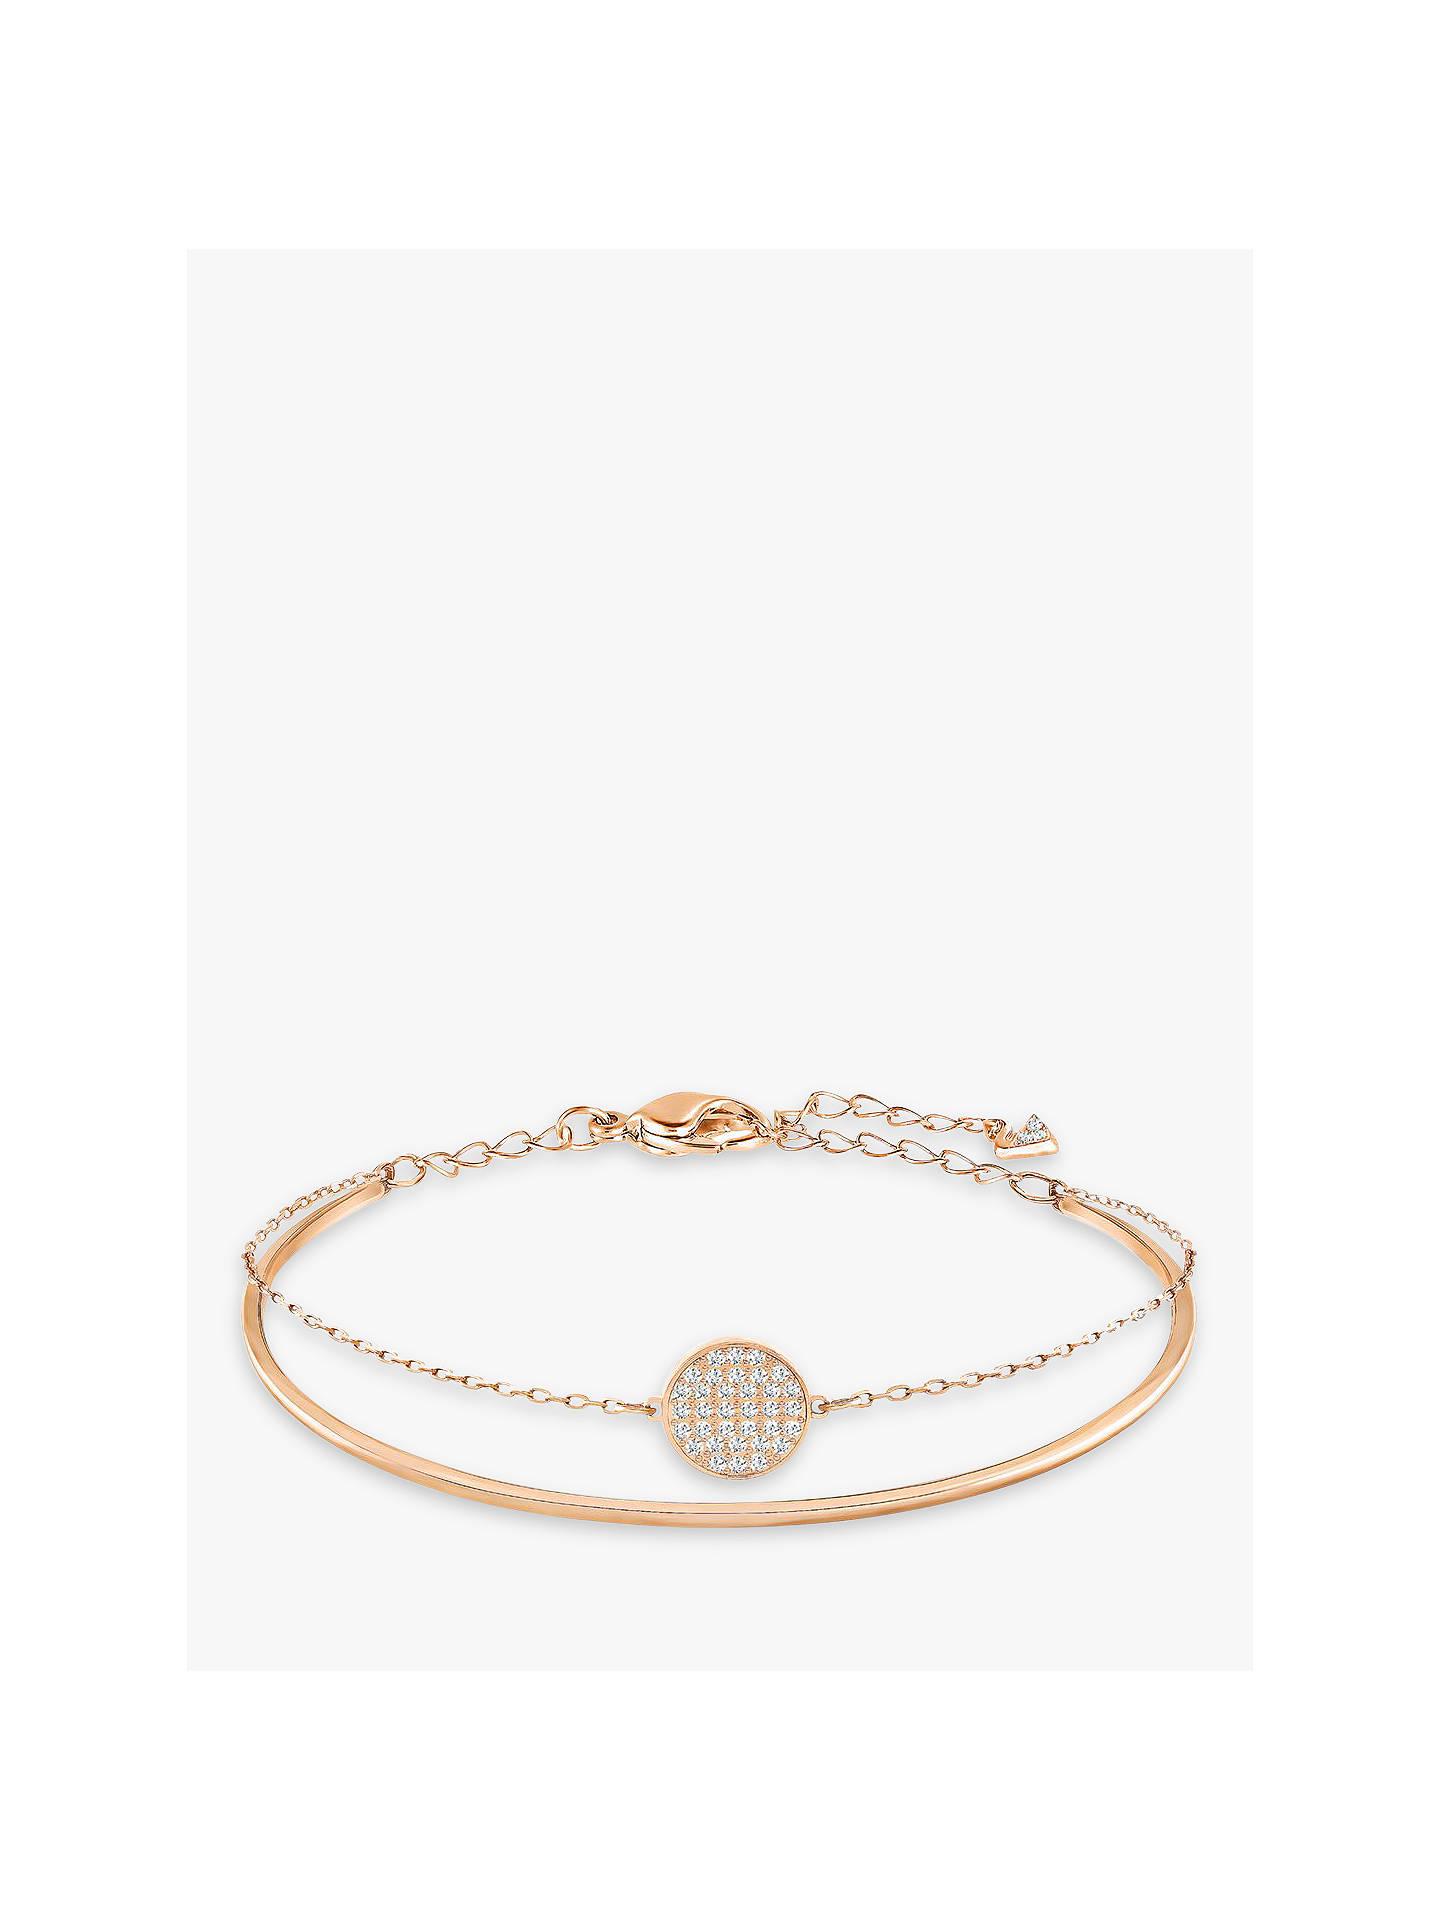 5a5f760ee Buy Swarovski Romance Crystal Round Charm Bangle, Rose Gold Online at  johnlewis.com